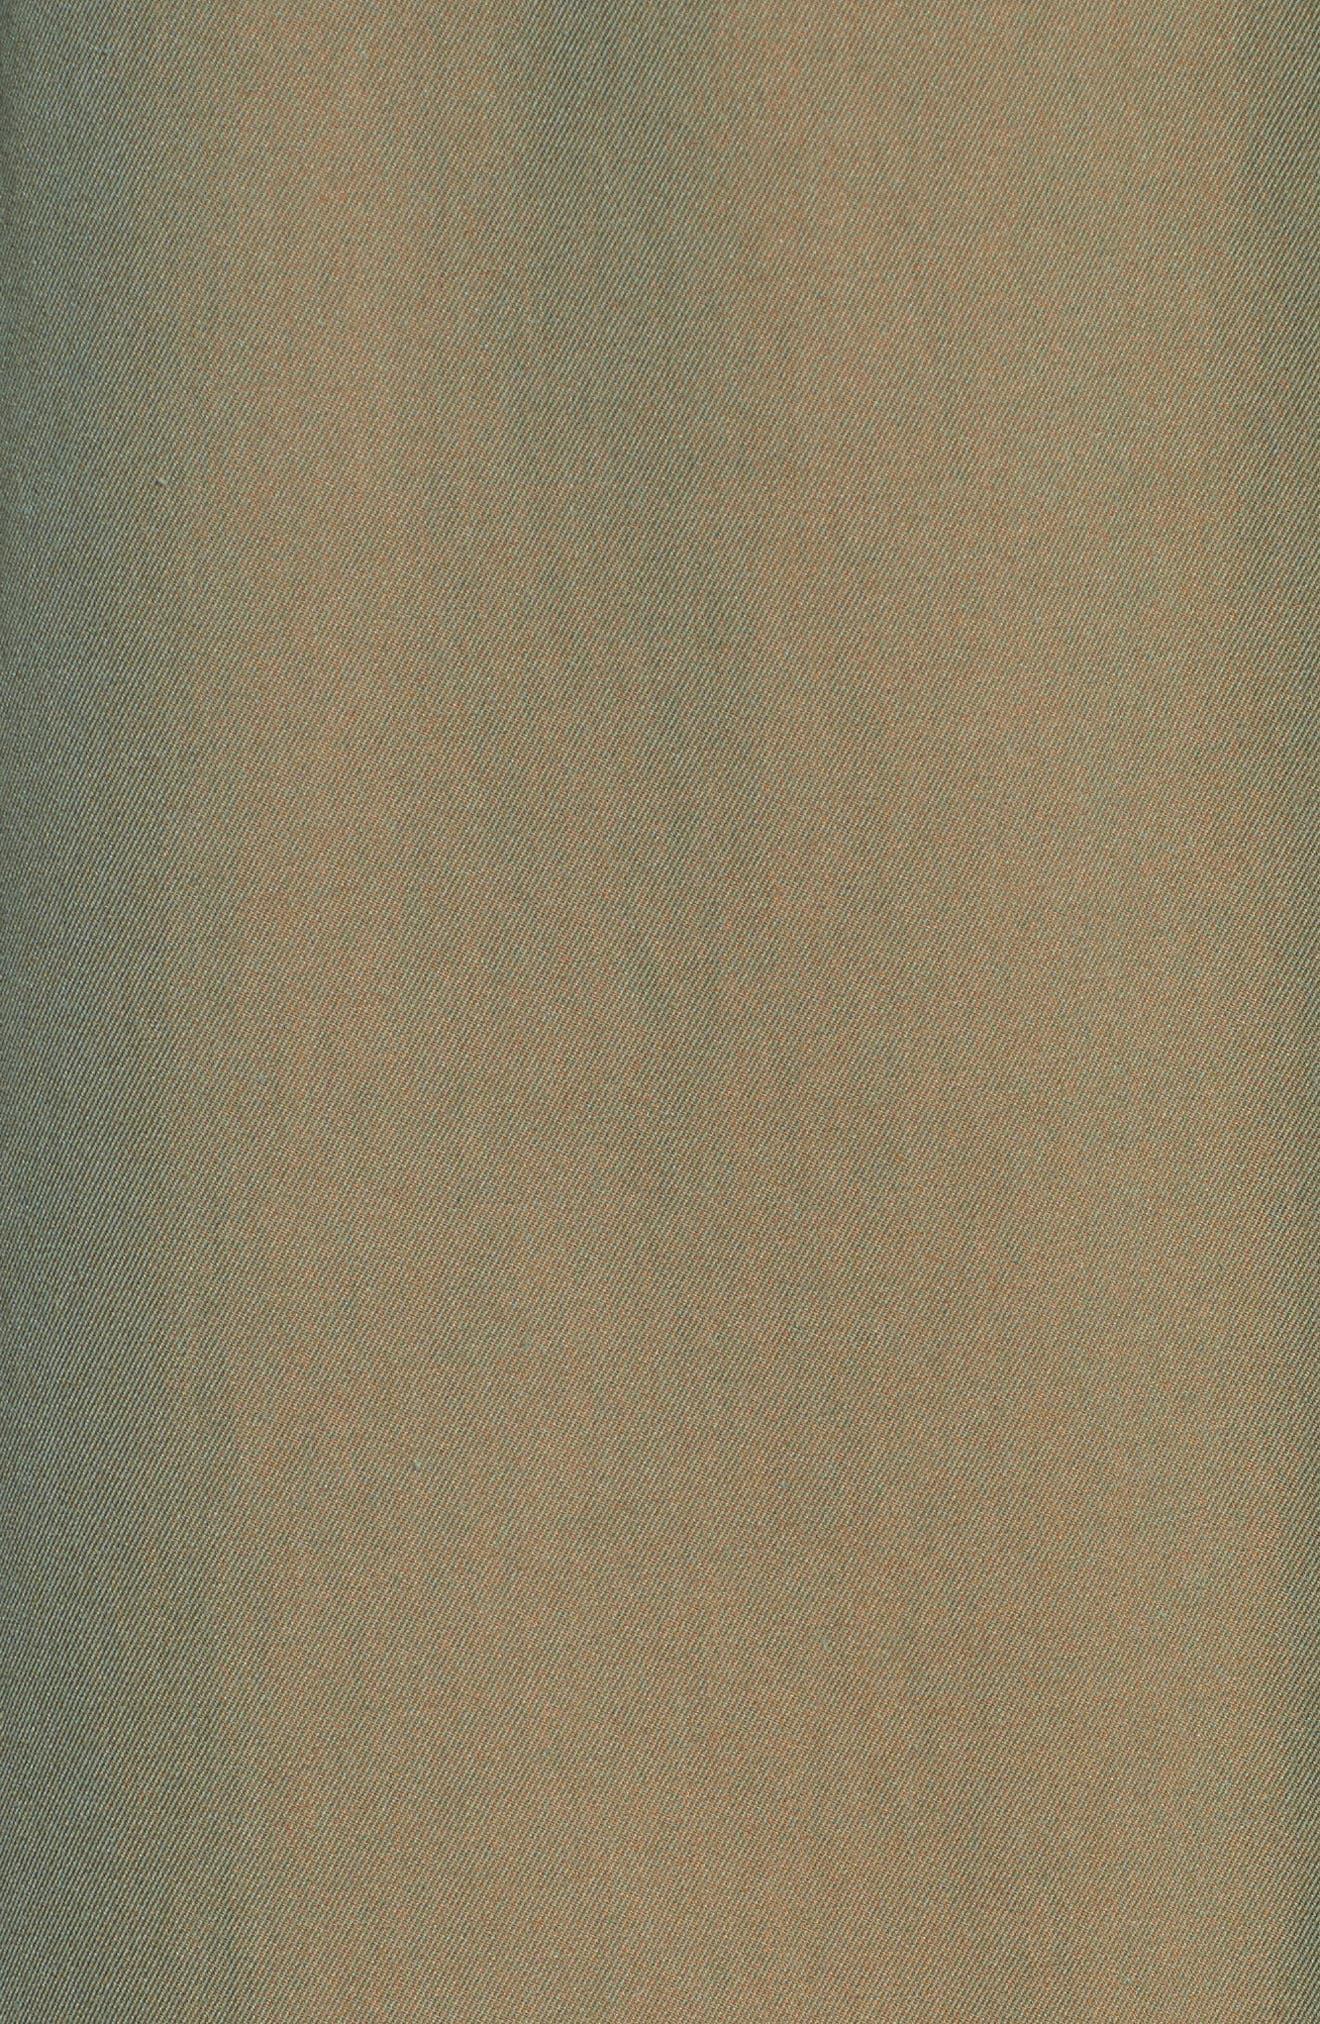 Allensford Raglan Trench Cape,                             Alternate thumbnail 3, color,                             Bright Olive